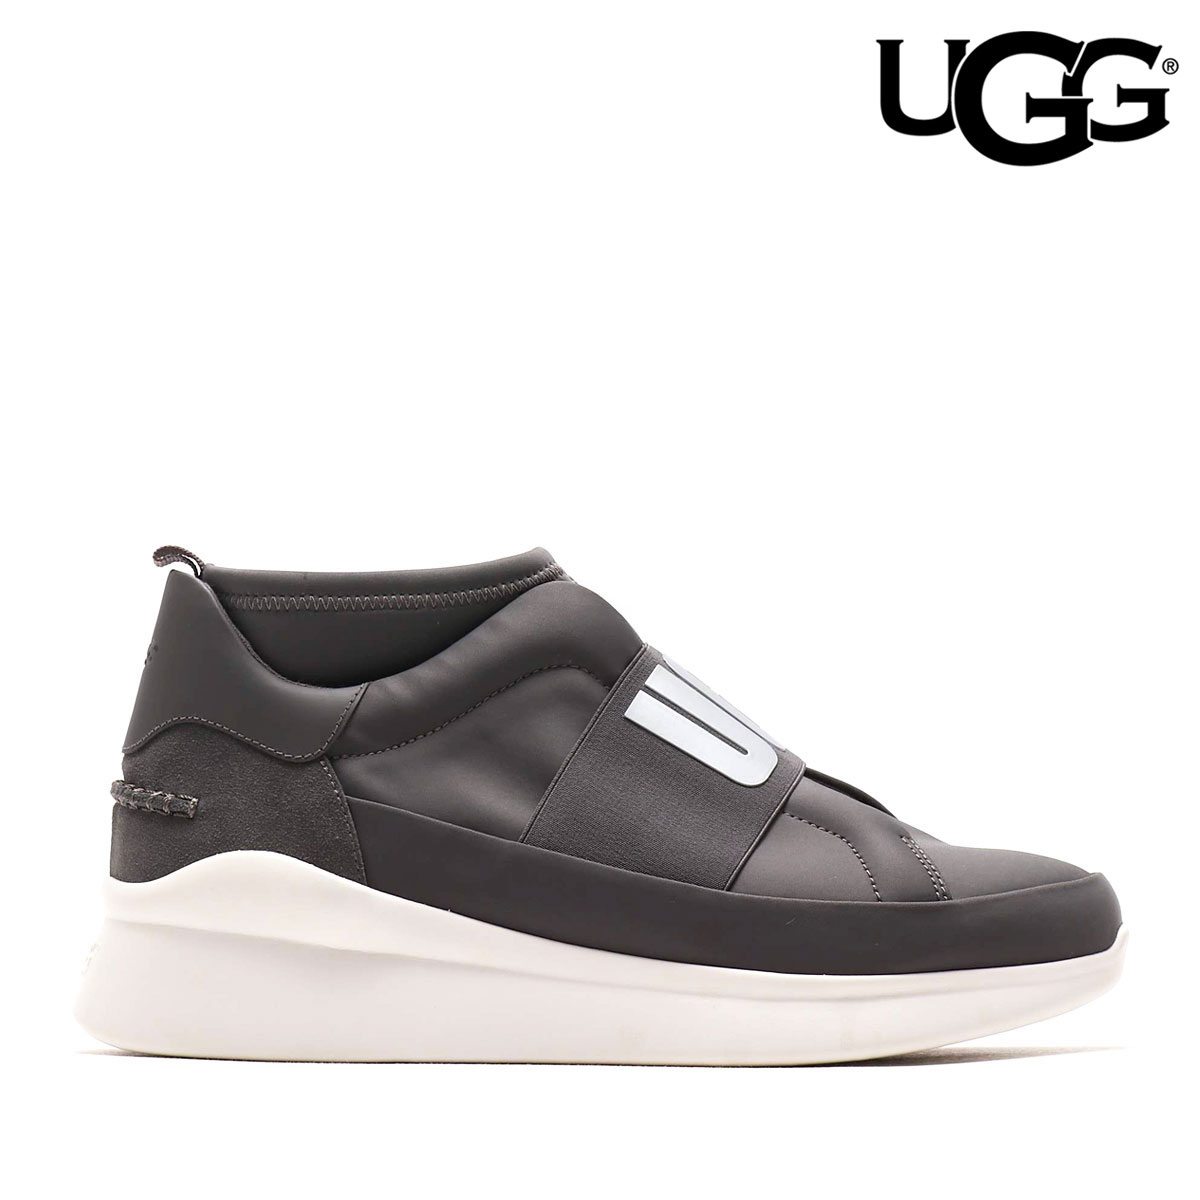 UGG Neutra Sneaker(CHARCOAL)(アグ ニュートラ スニーカー)【レディース】【スニーカー】【19SS-I】